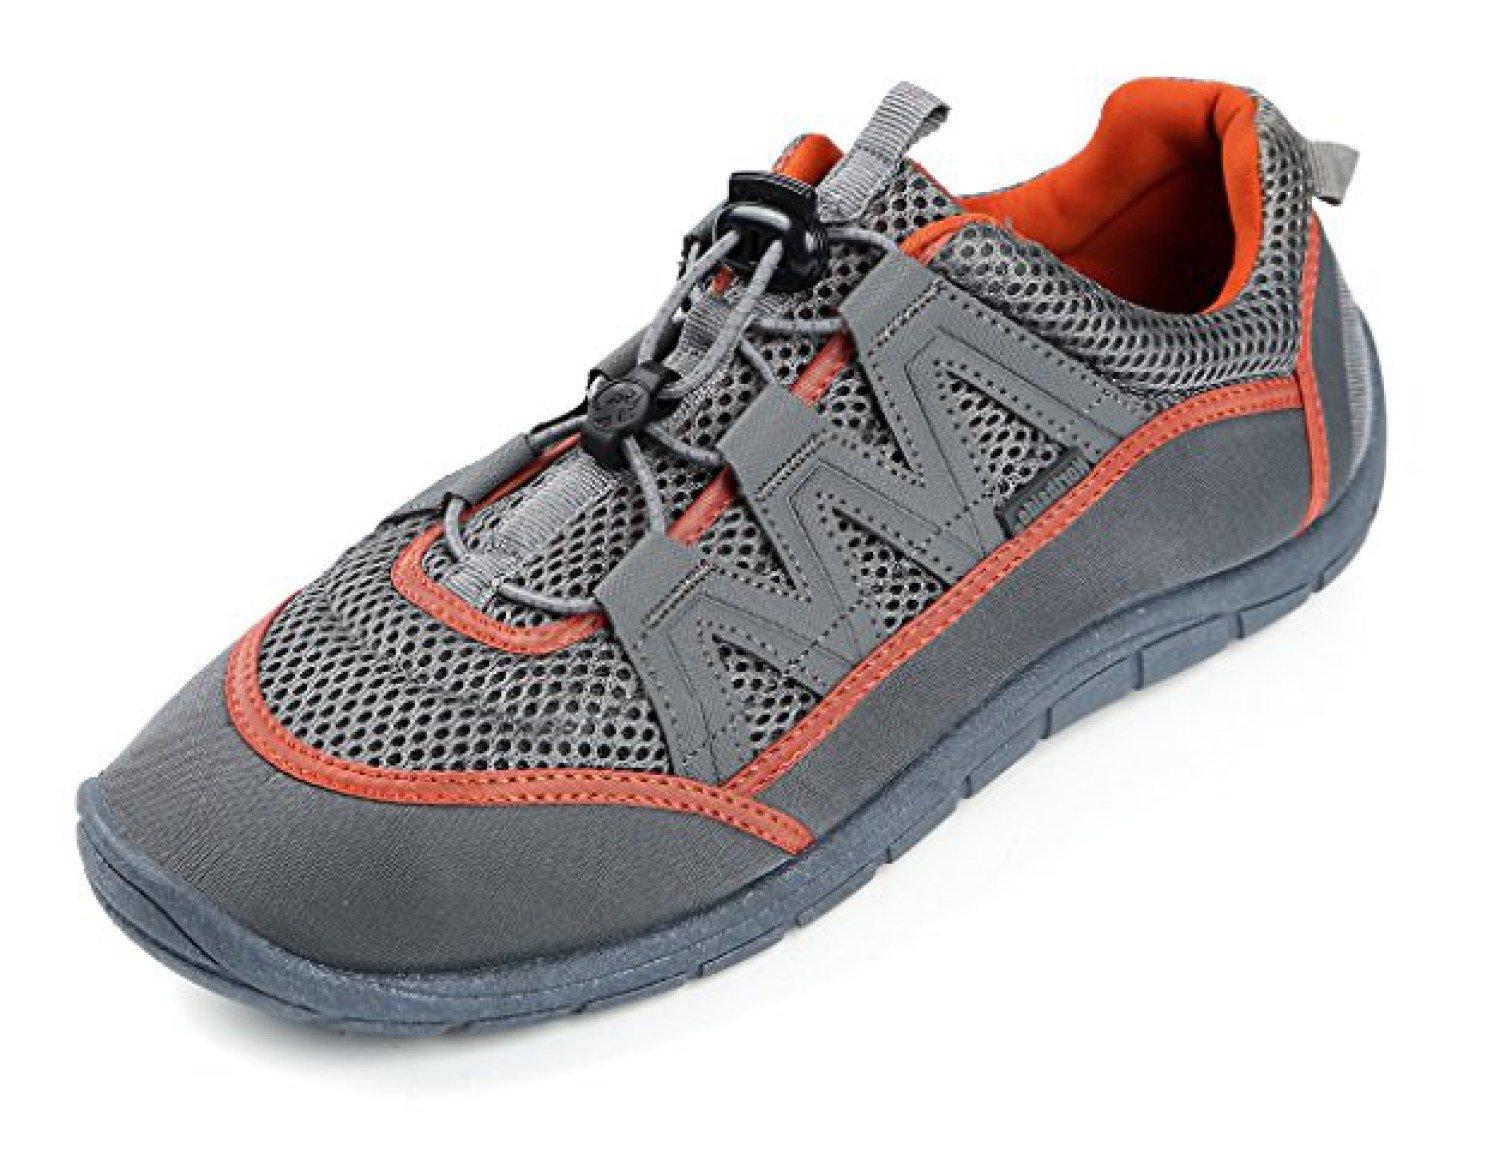 Northside Men's Brille II Summer Water Shoe, Charcoal/Orange, 13 D(M) US; with a Waterproof Wet Dry Bag